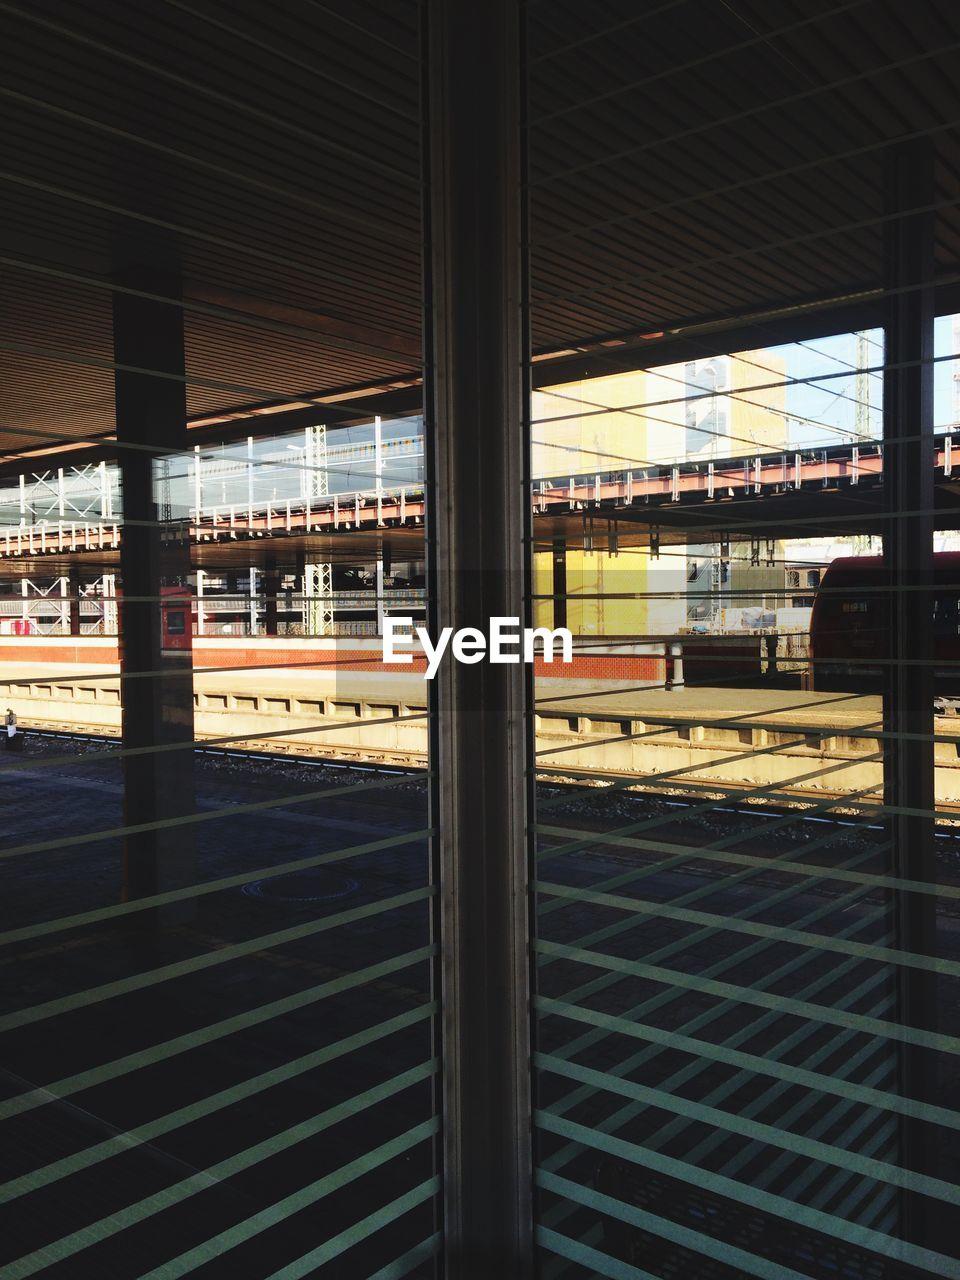 transportation, indoors, public transportation, architecture, railroad station platform, railroad station, built structure, window, day, rail transportation, no people